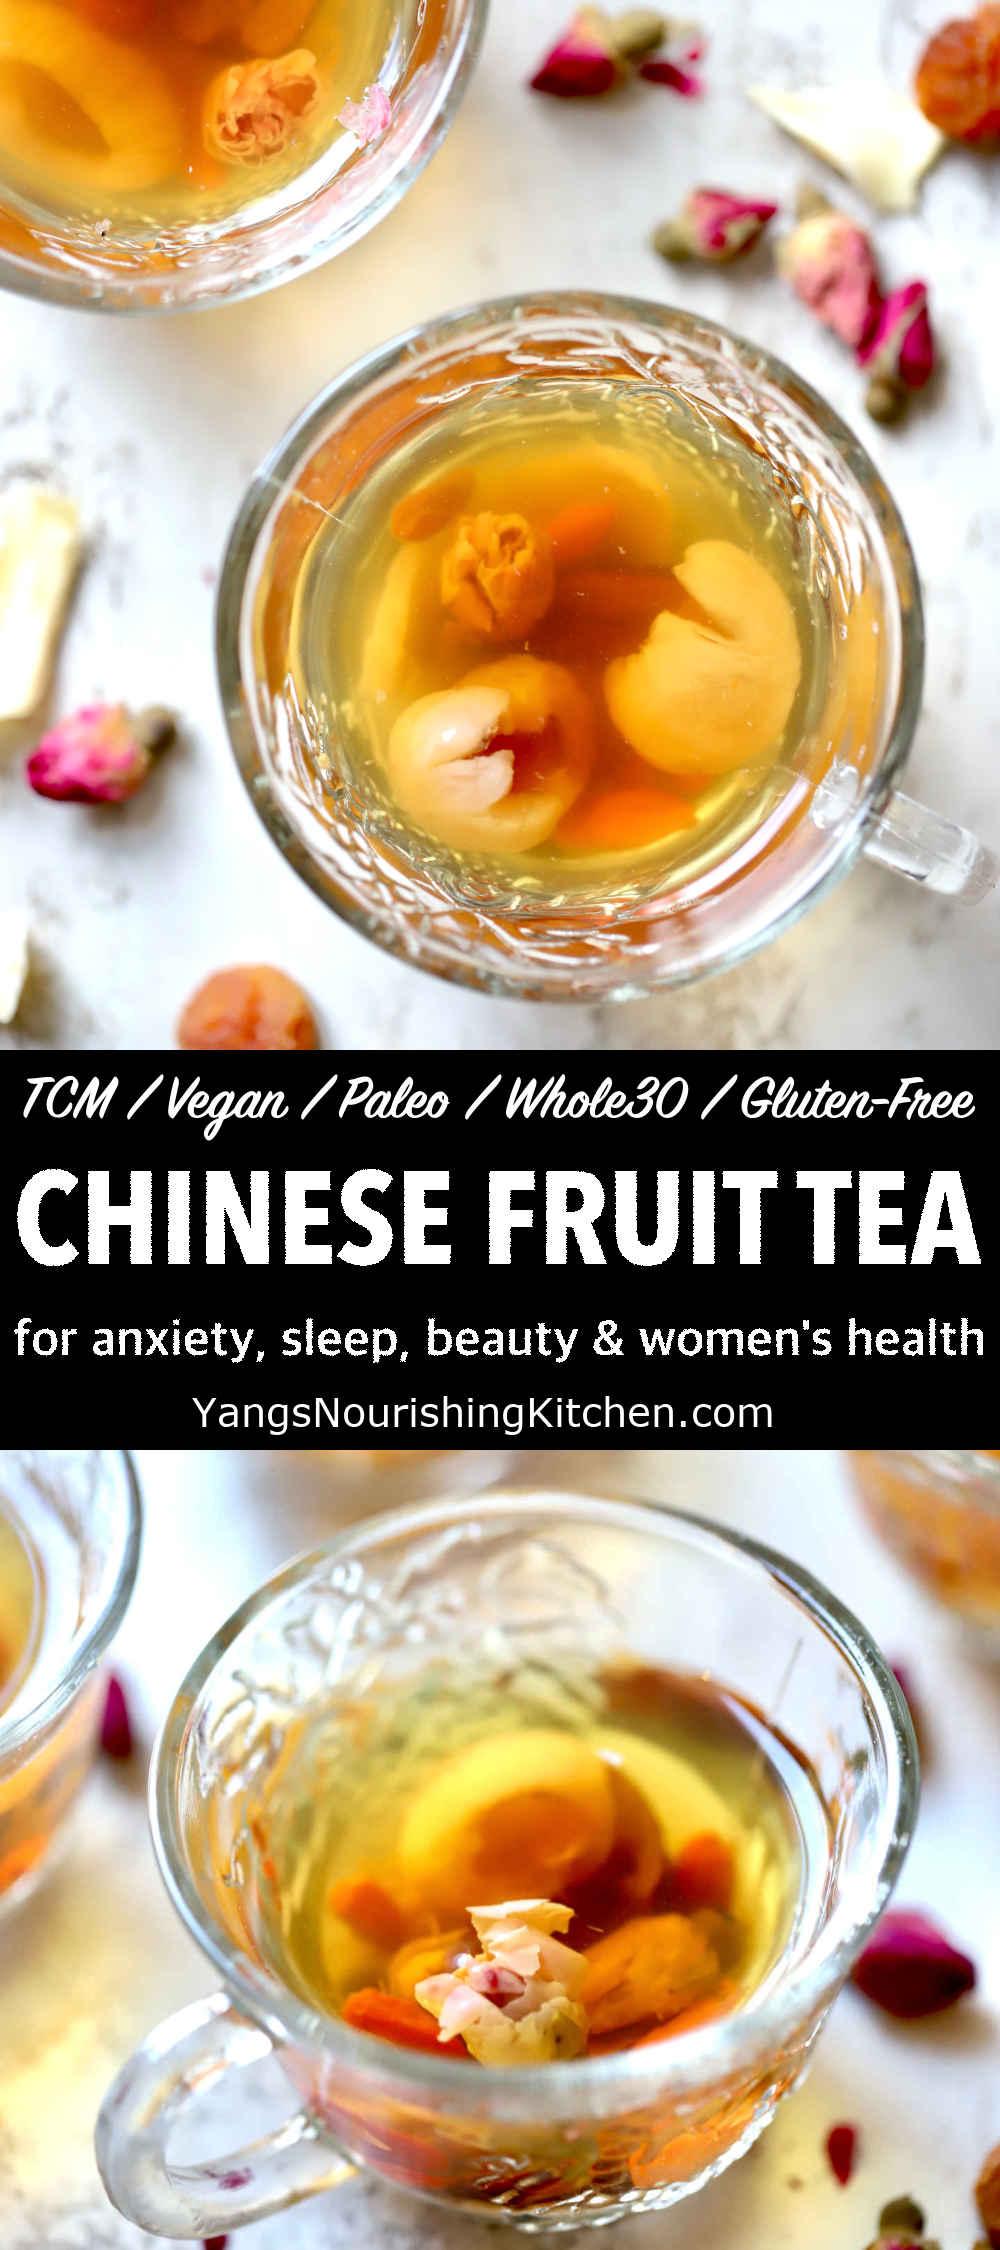 Bedtime Calming Tea (TCM, Vegan, Paleo)